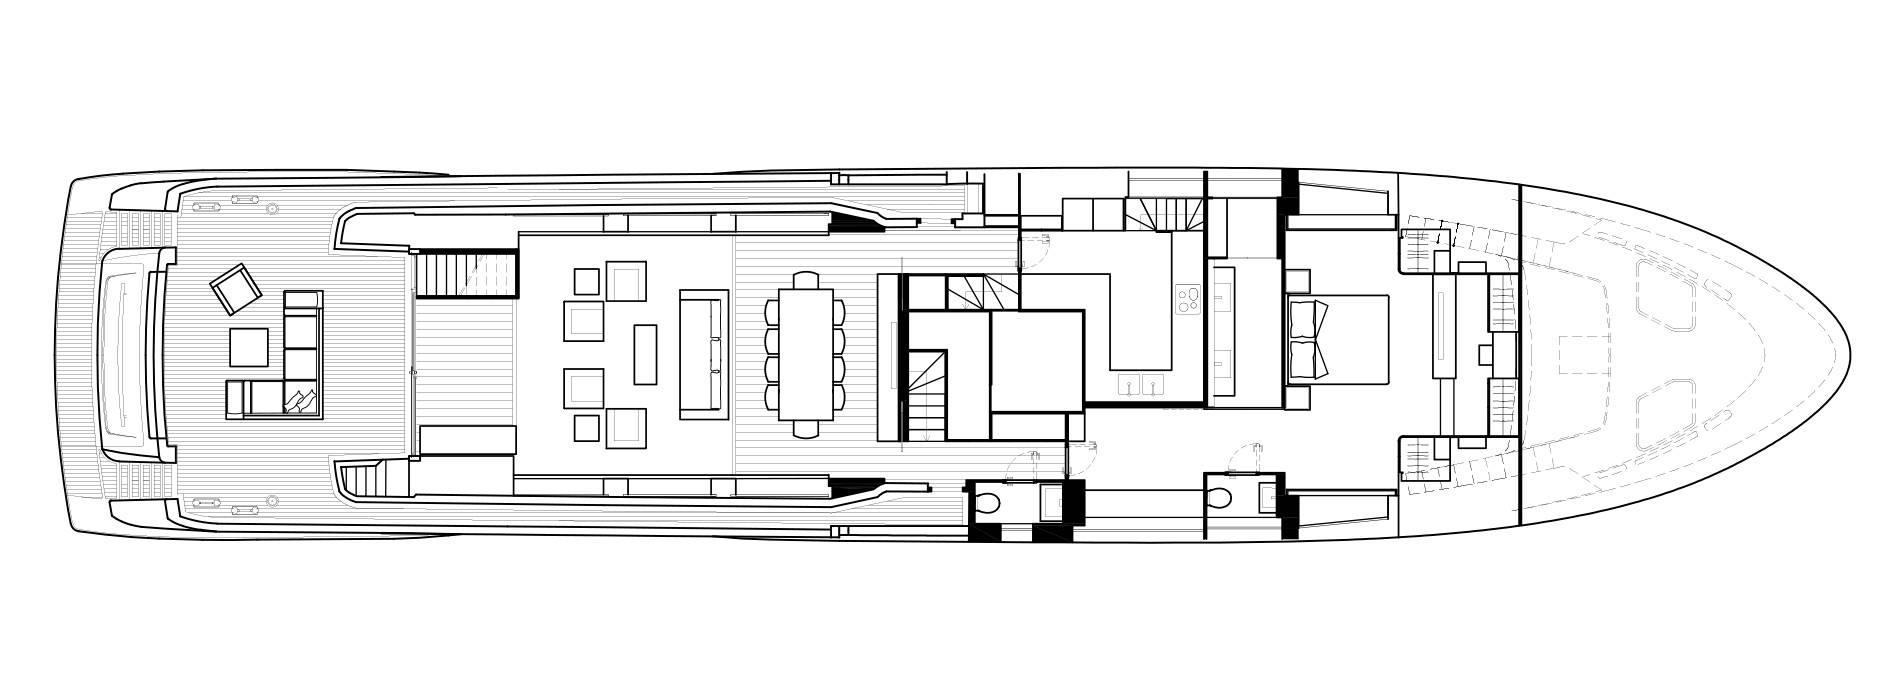 Sanlorenzo Yachts SL118 主甲板